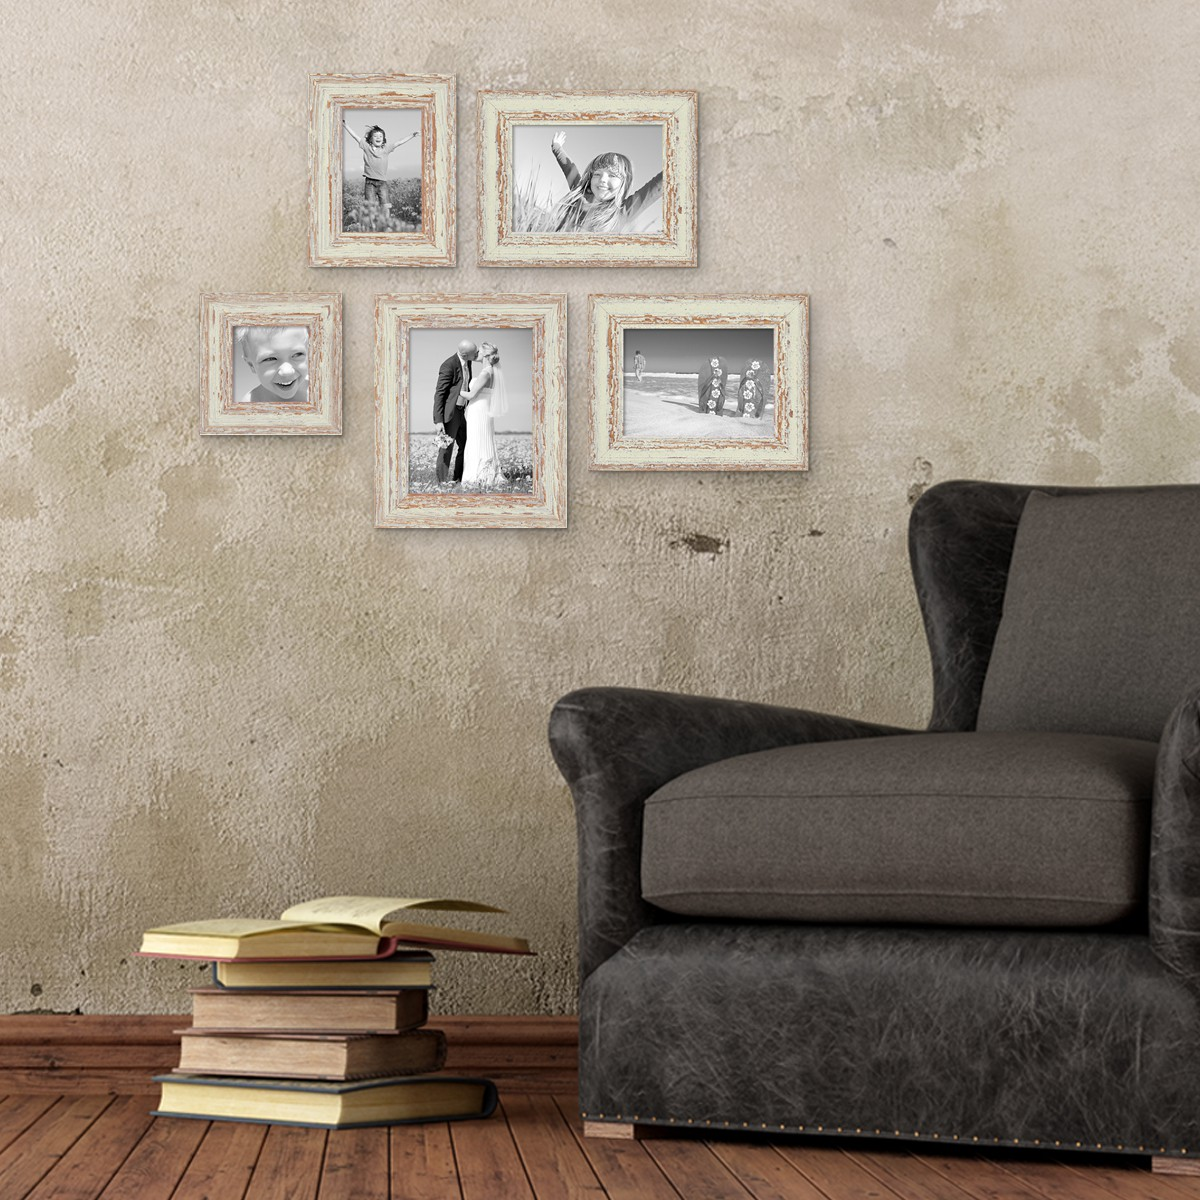 5er set bilderrahmen weiss shabby chic vintage 10x10 10x15. Black Bedroom Furniture Sets. Home Design Ideas